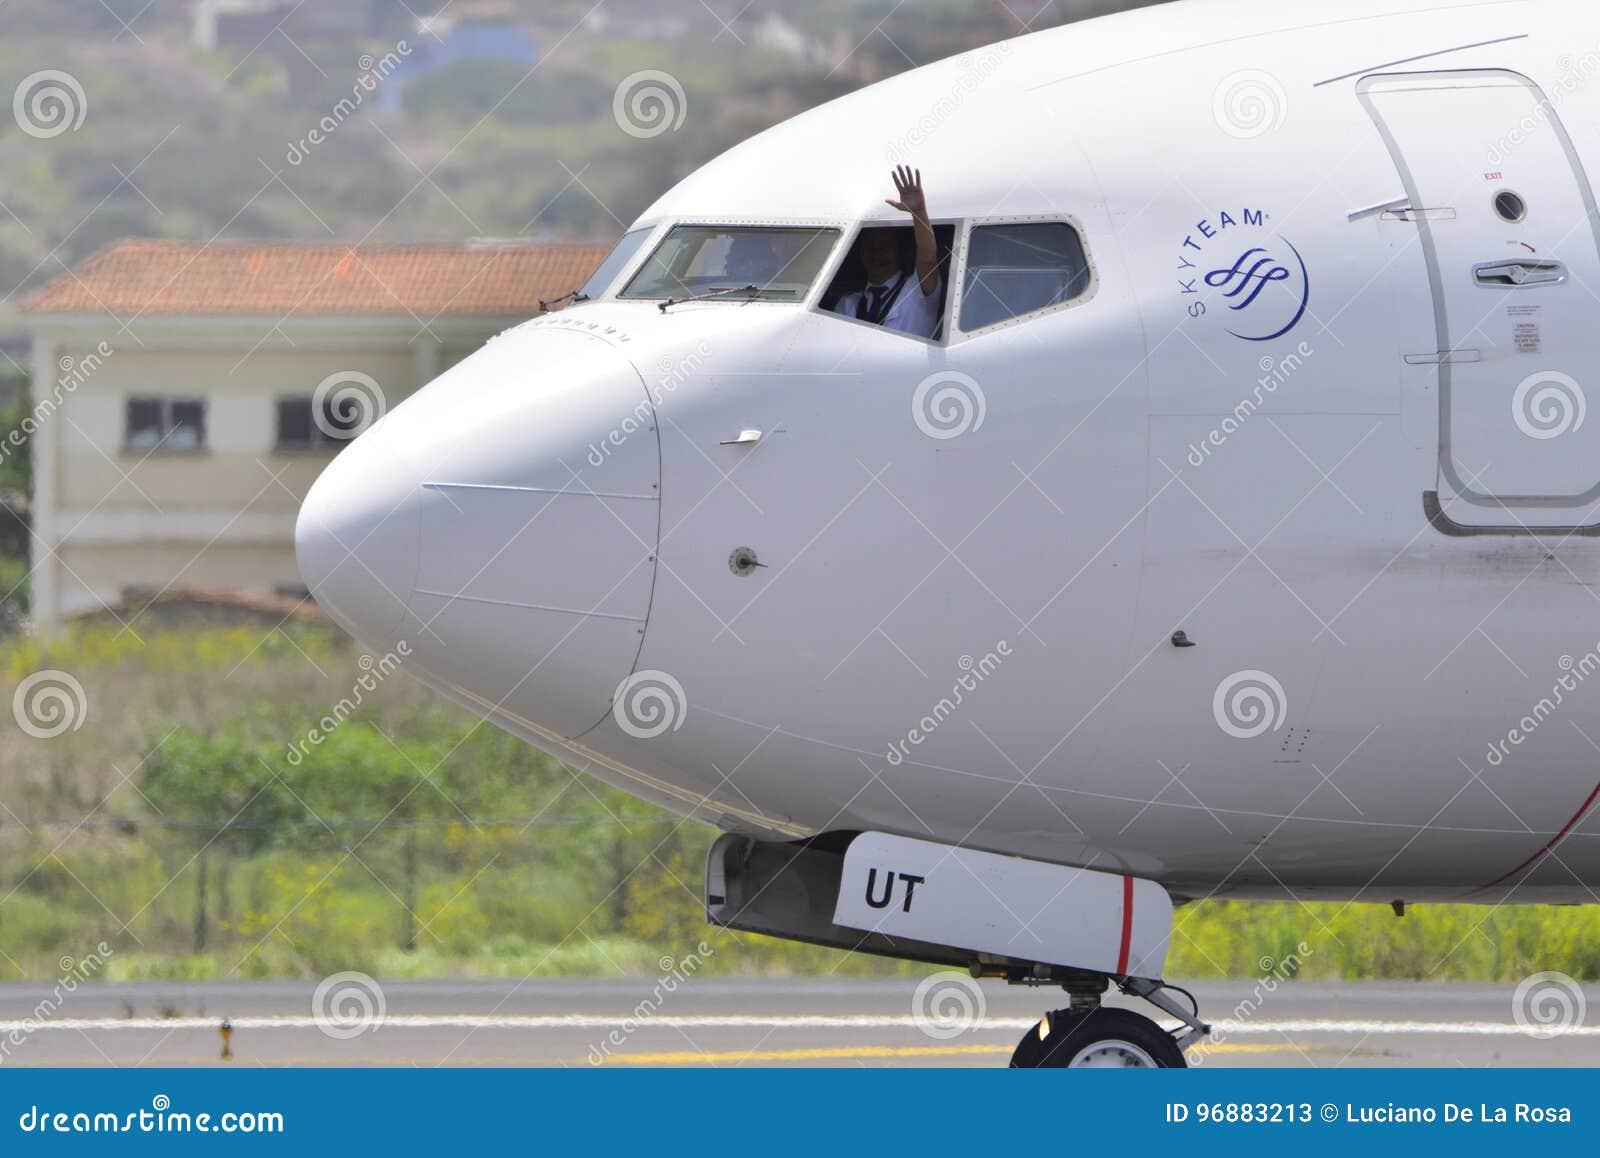 TENERIFE JULY 27: Plane Landing, July 27, 2017, Tenerife